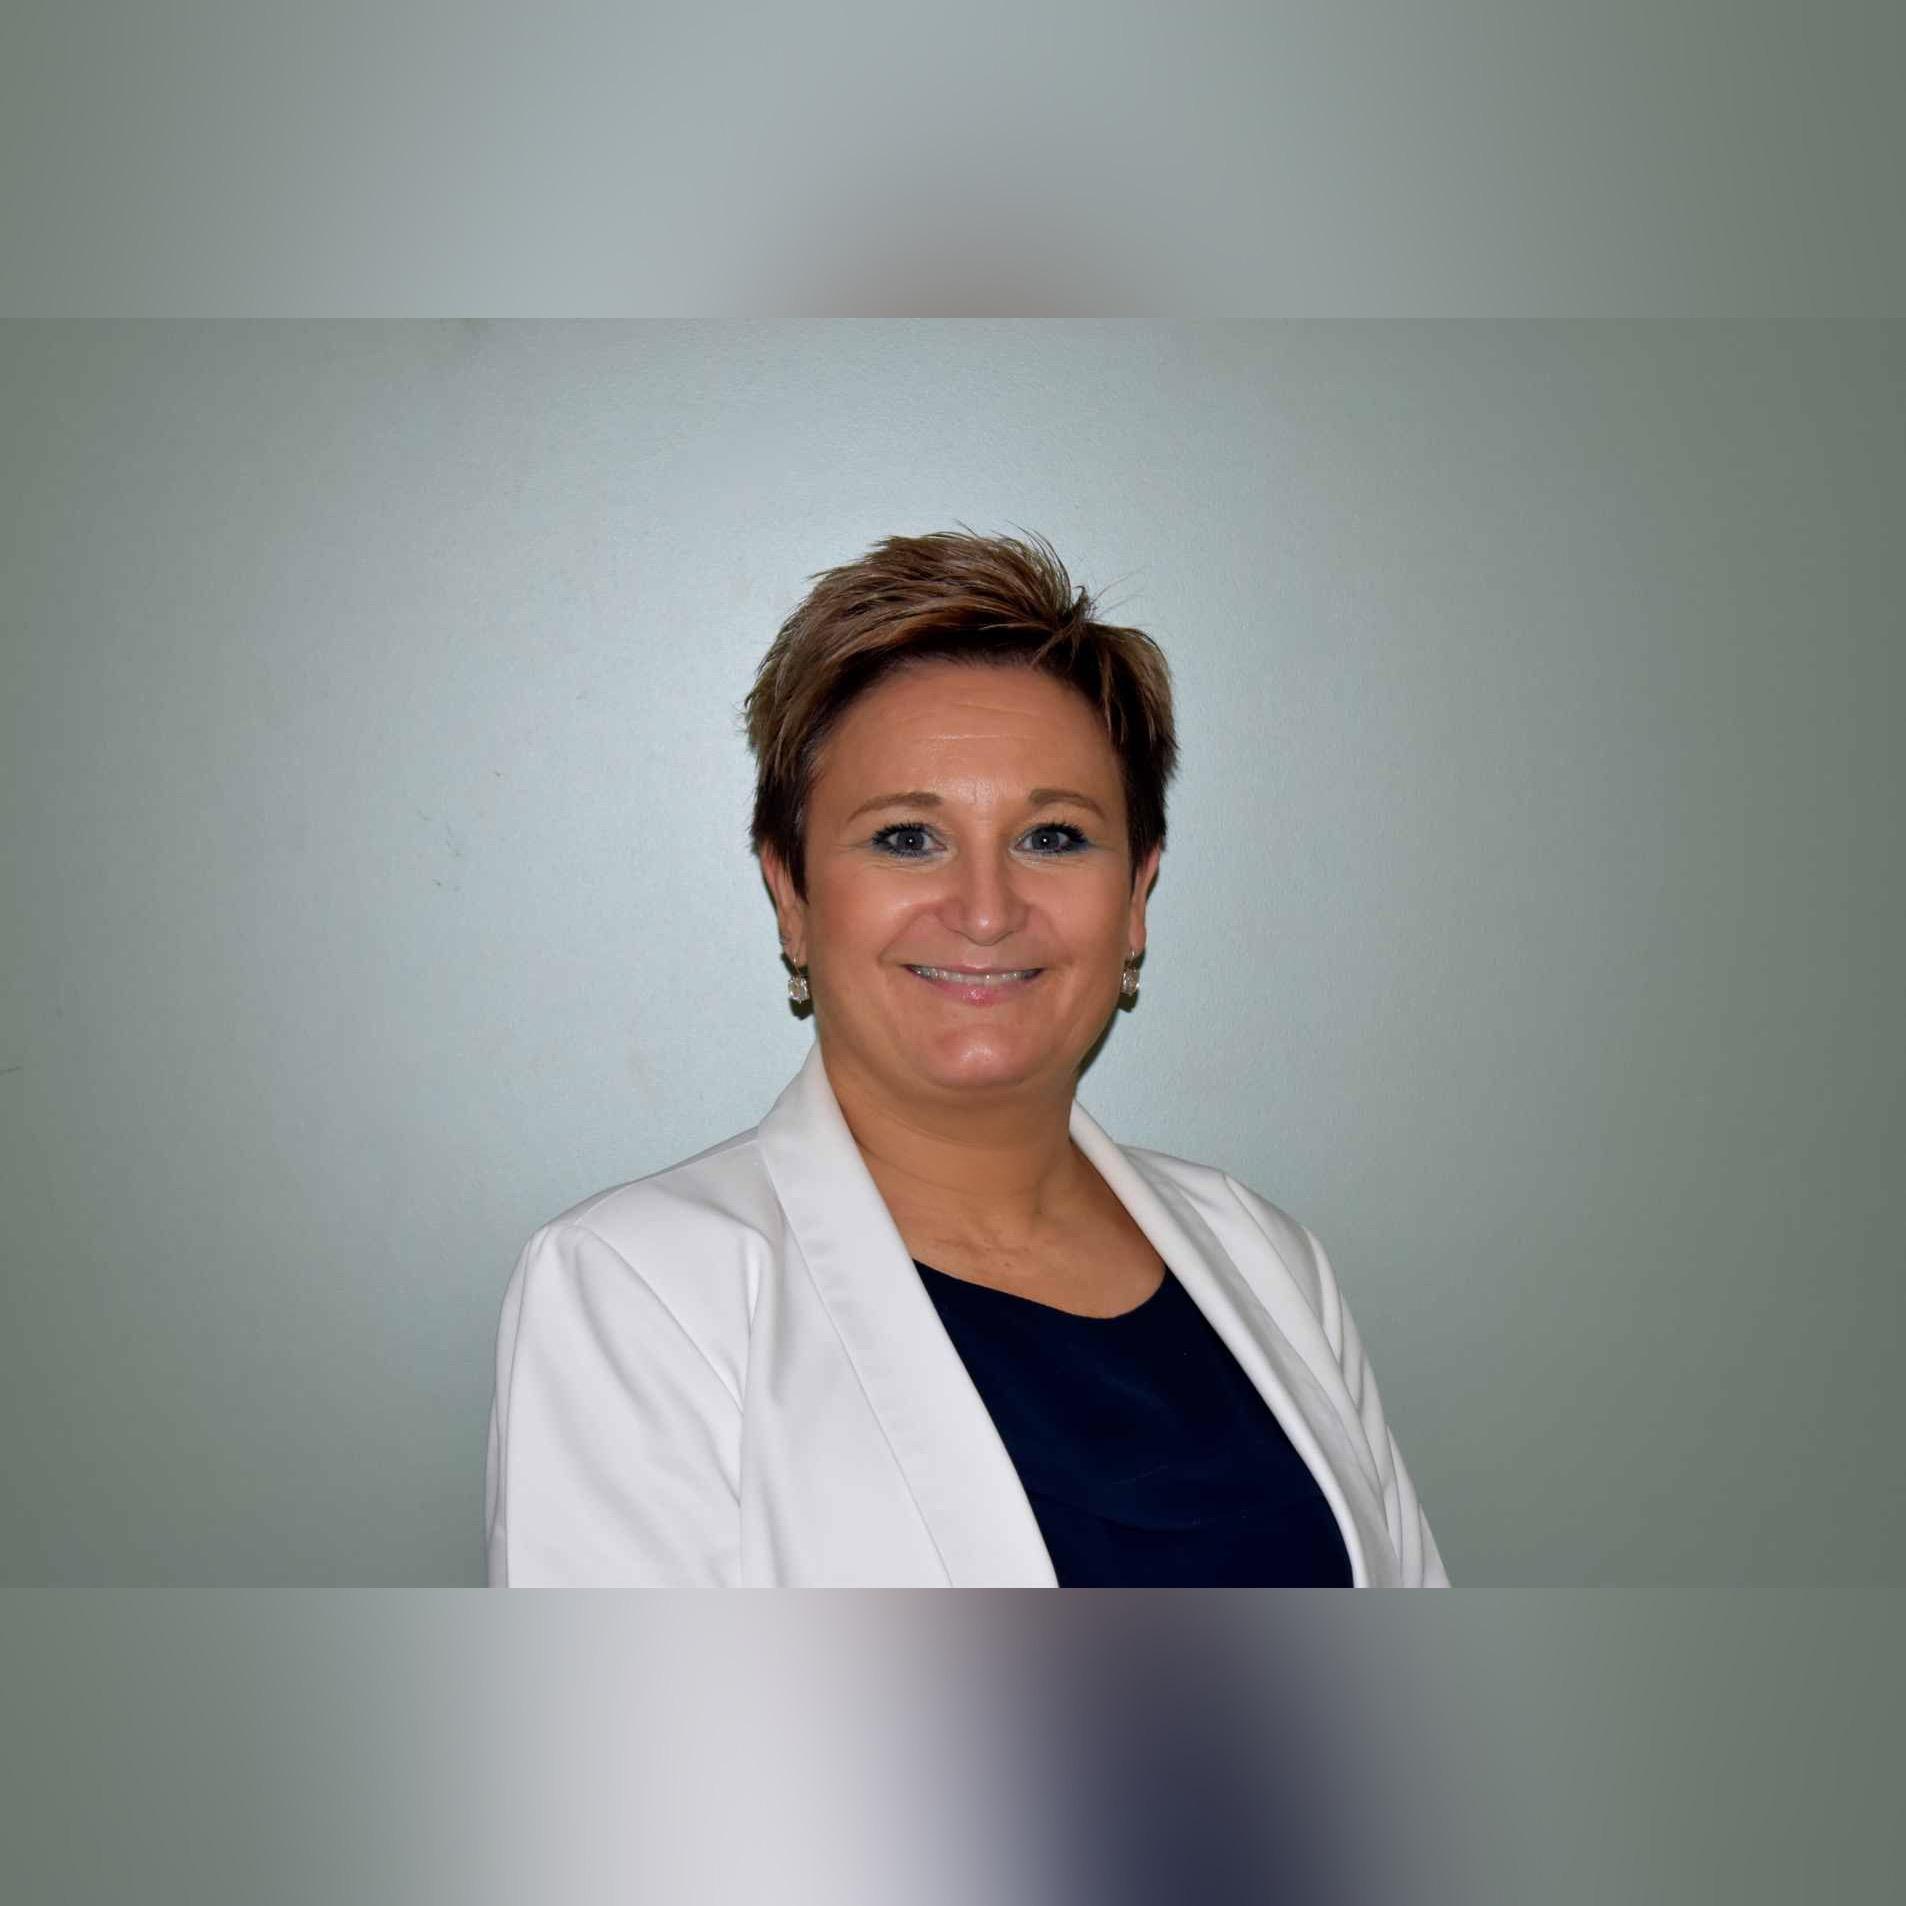 Vice-Présidente LANGERS-ZWANK Esther